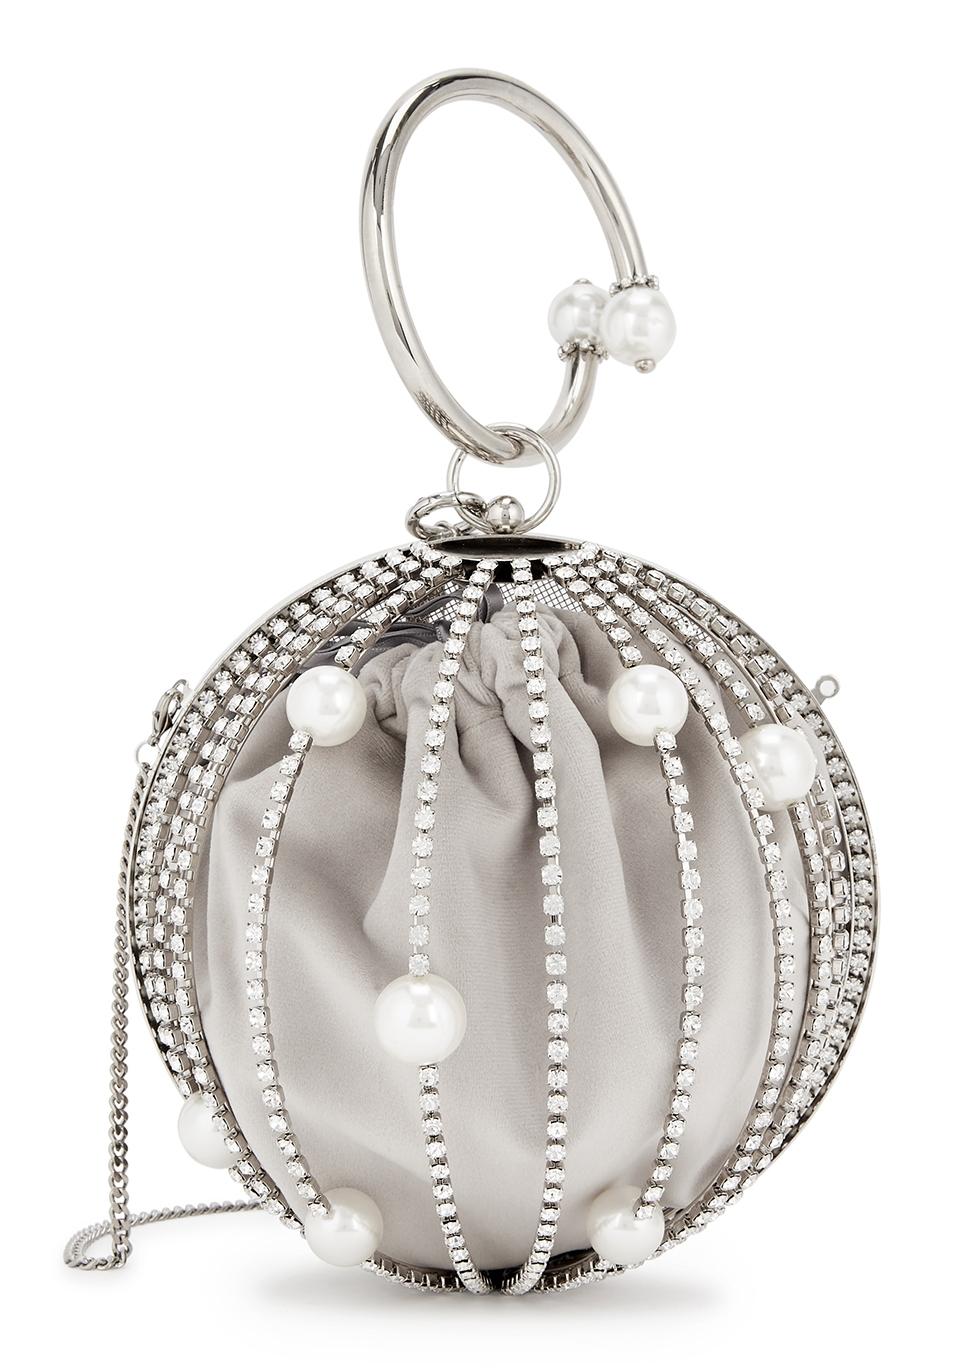 Ruby crystal-embellished top handle bag